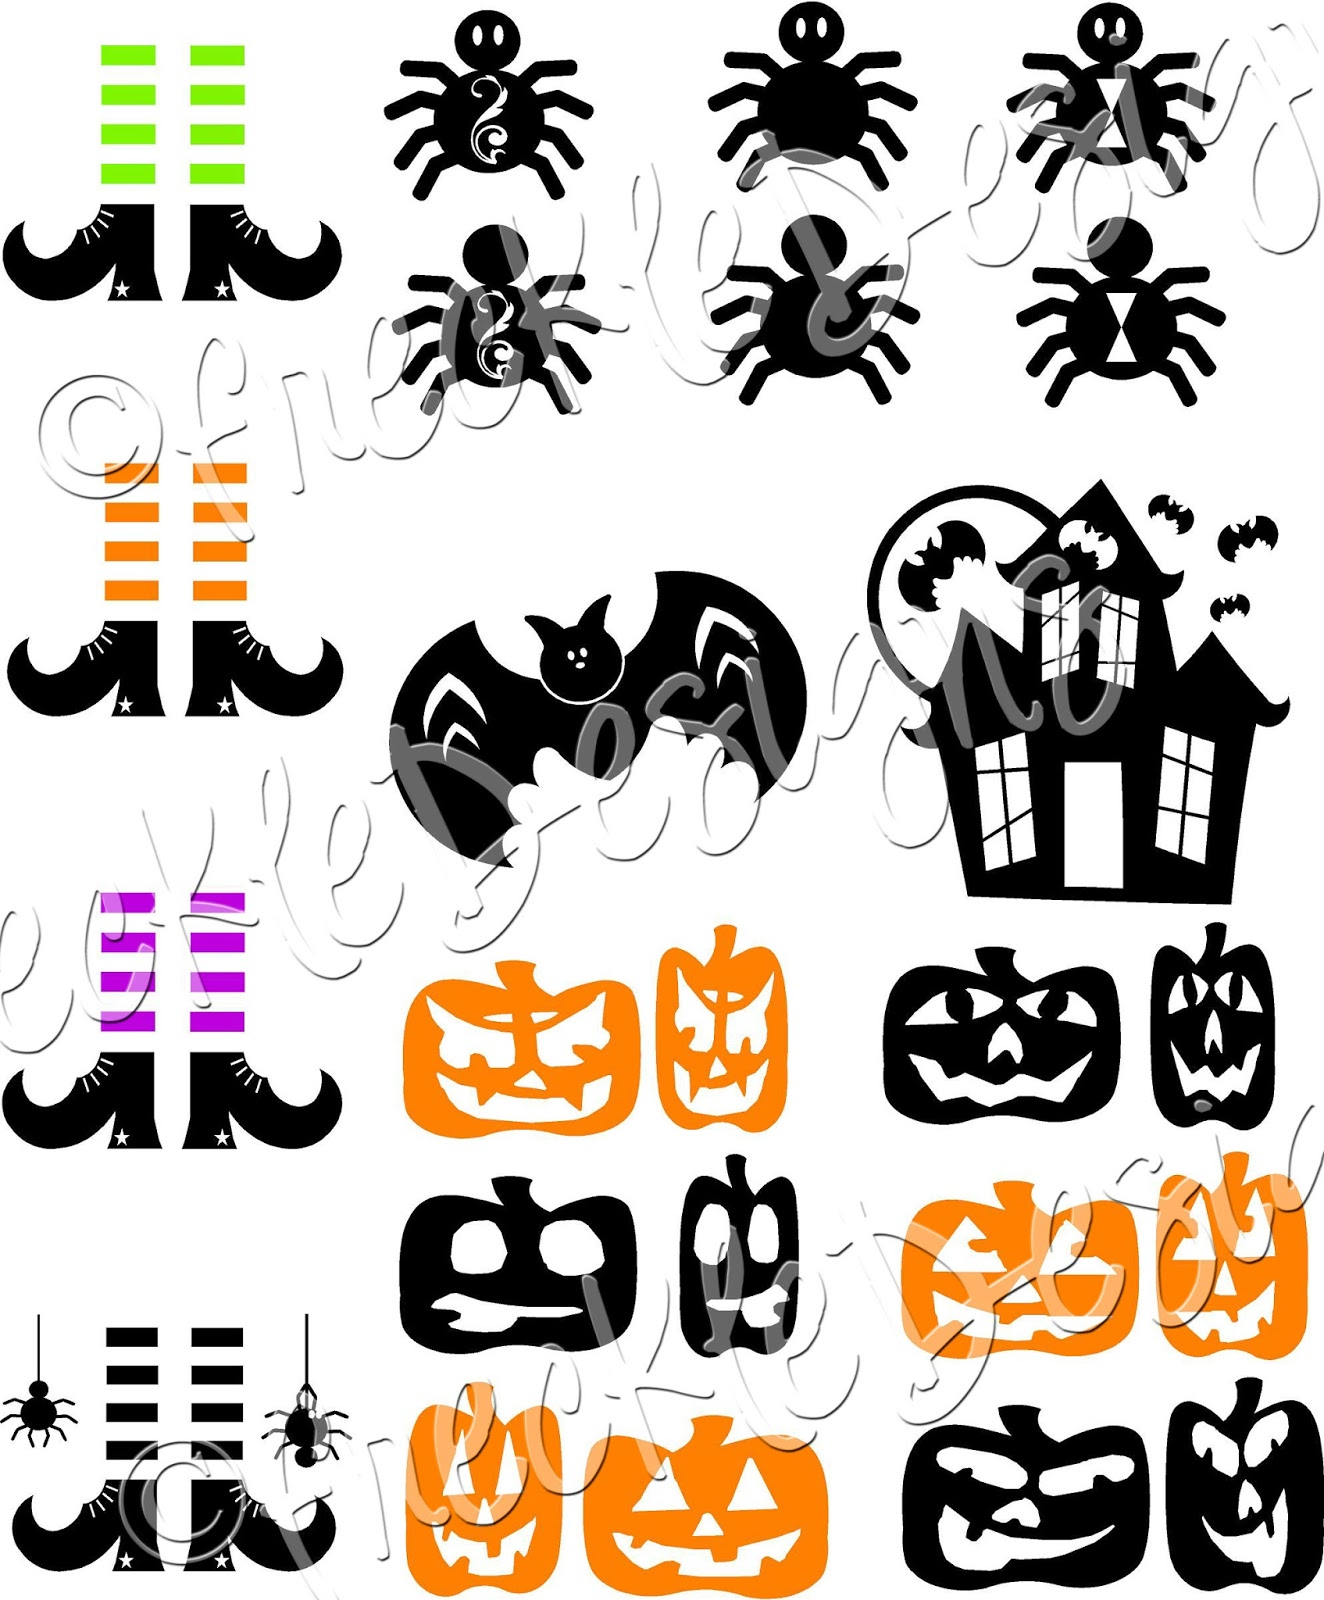 Freckle Designs